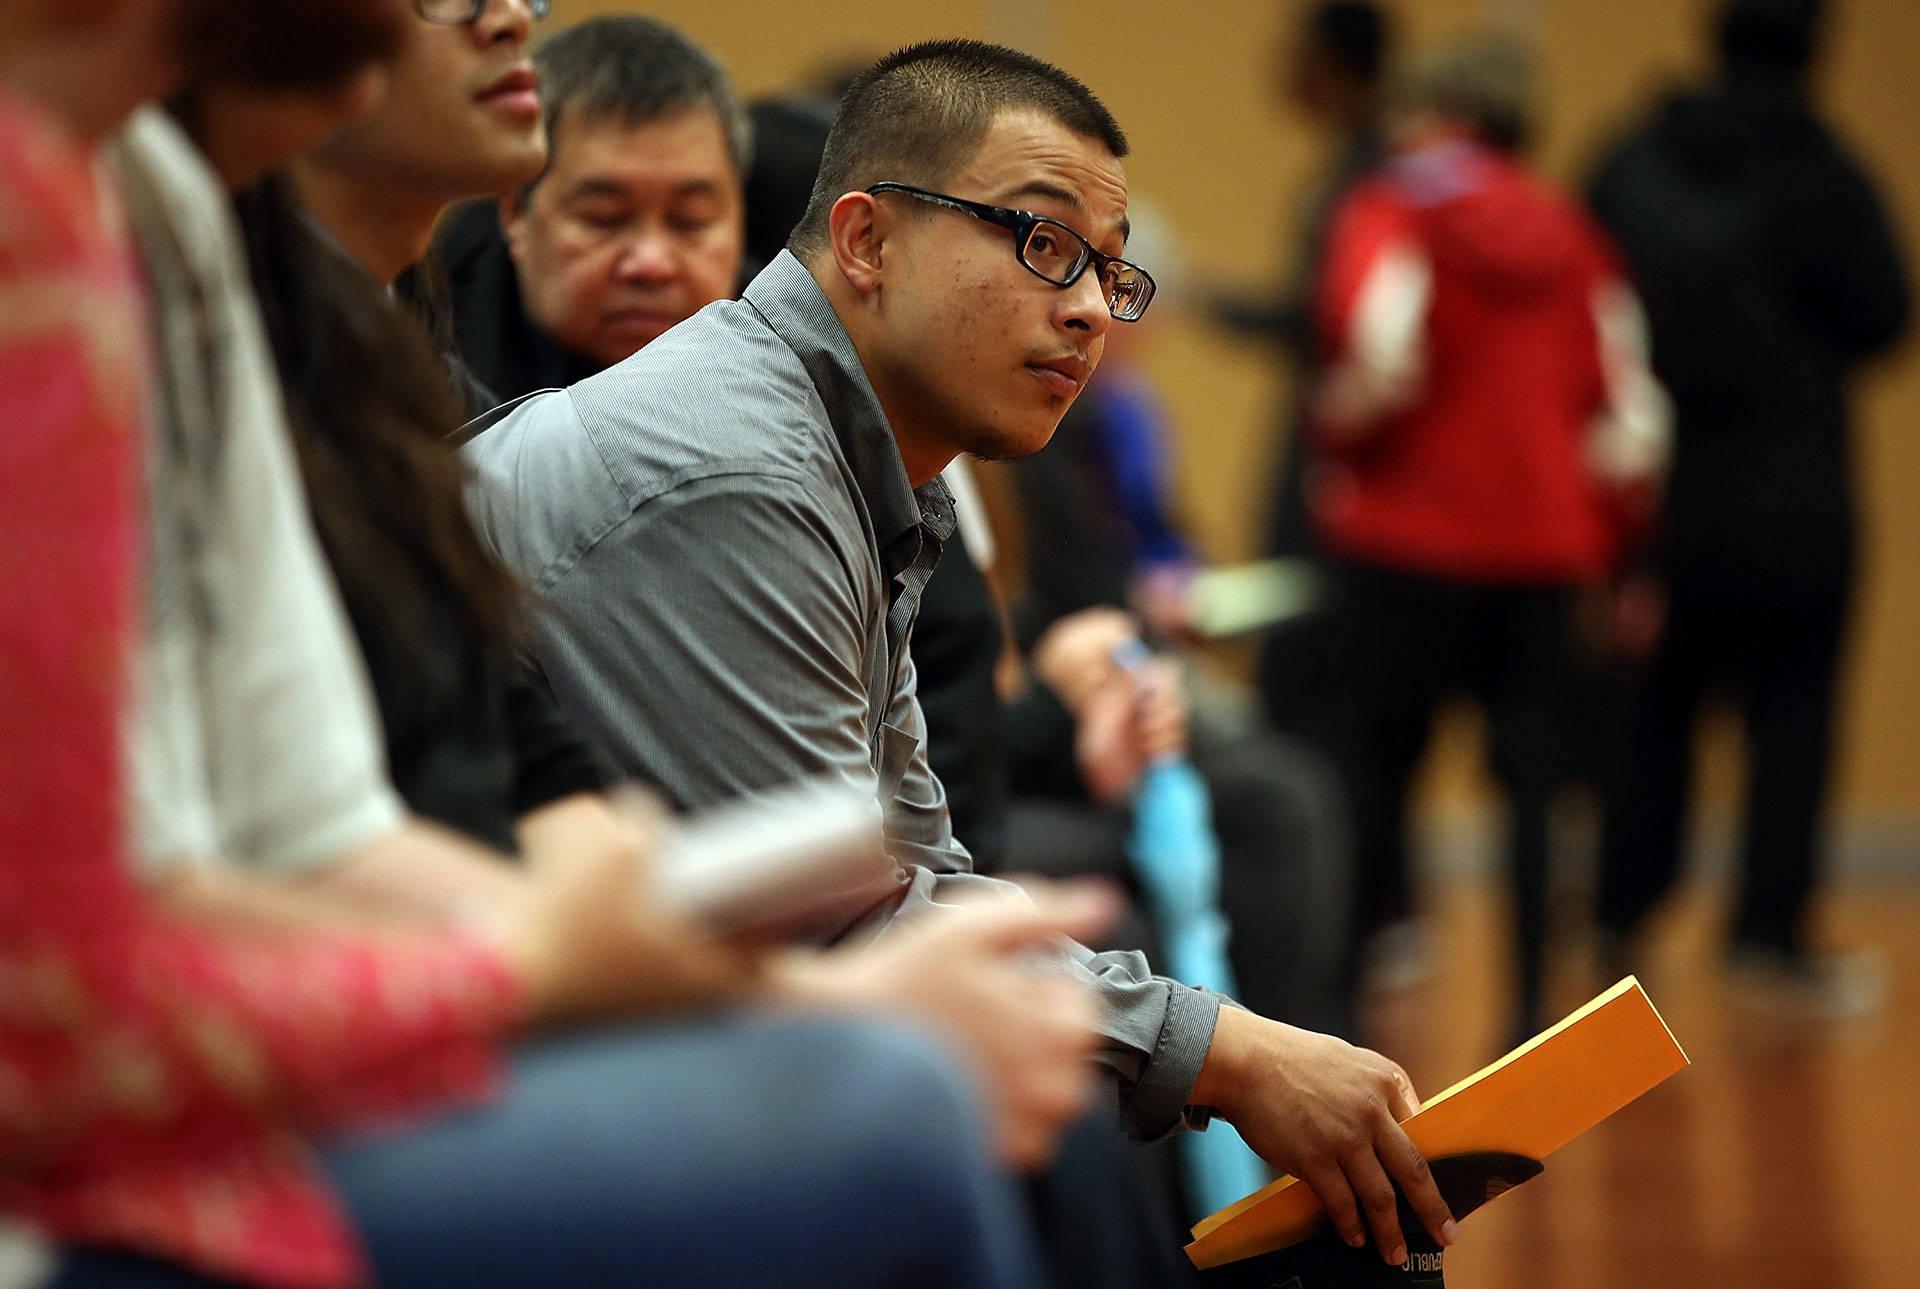 A job seeker waits to be interviewed during a job fair in Santa Clara. Justin Sullivan/Getty Images